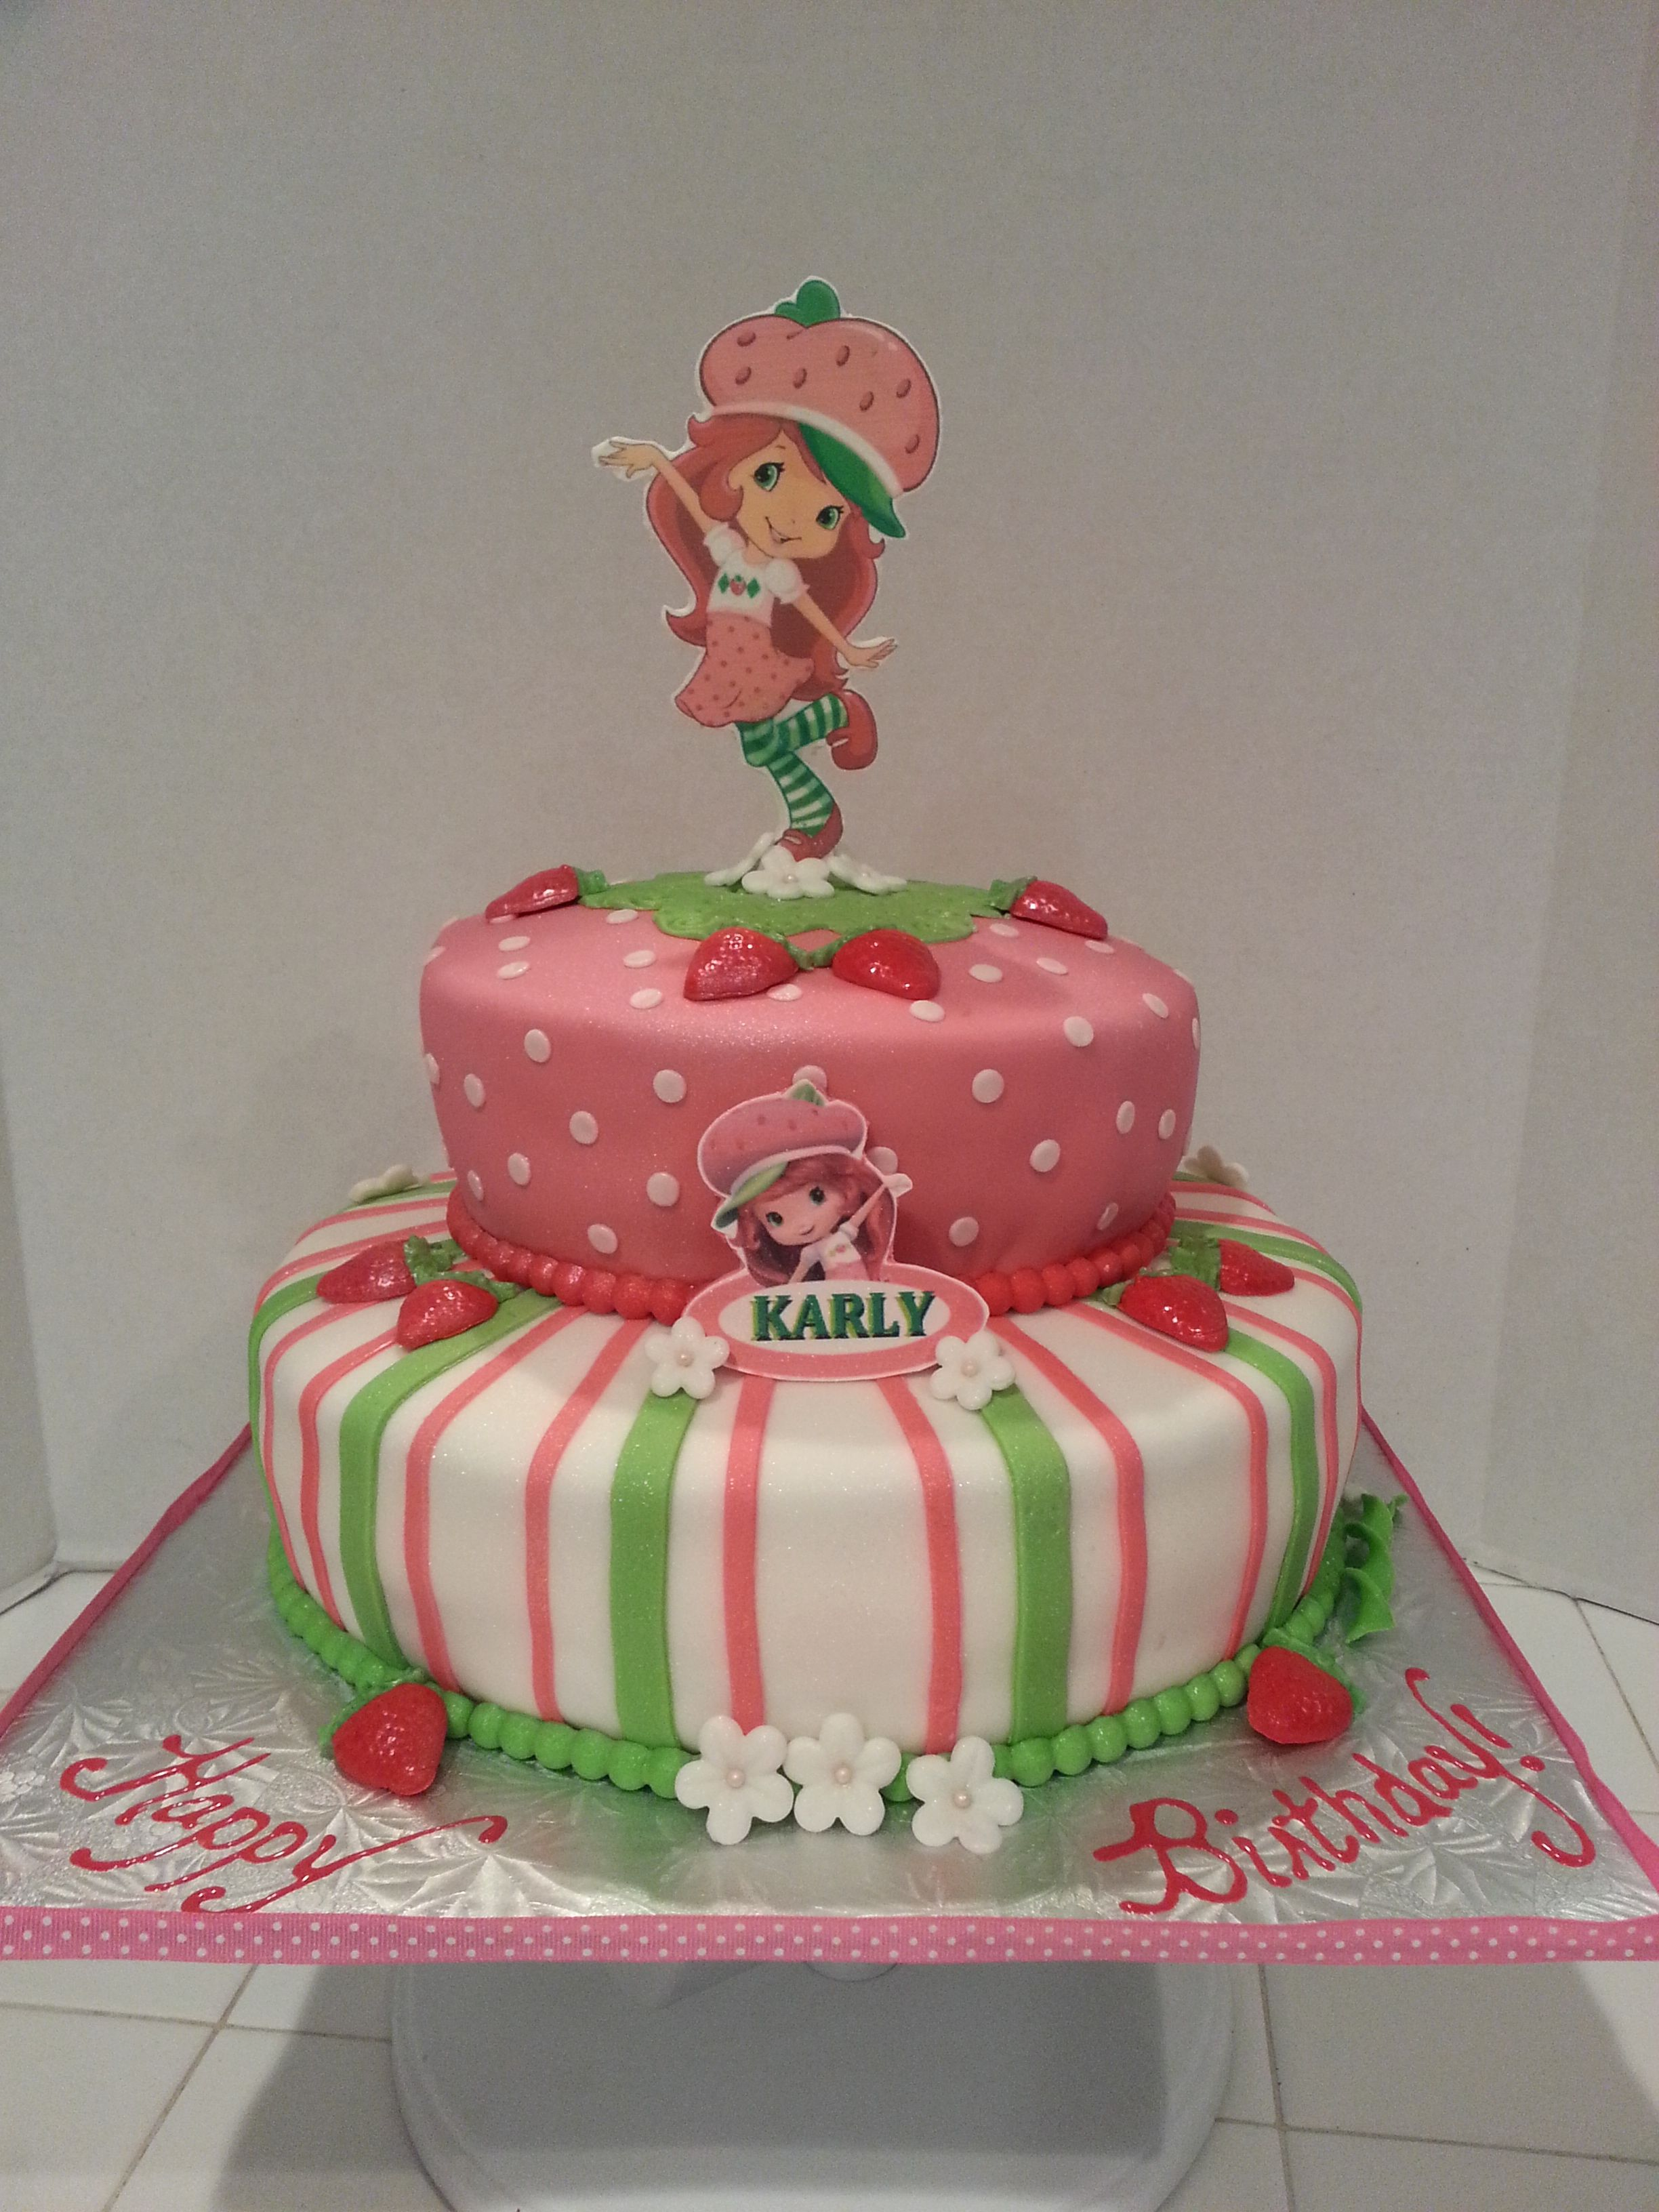 Childrens Birthday Cakes Strawberry Shortcake Books Worth